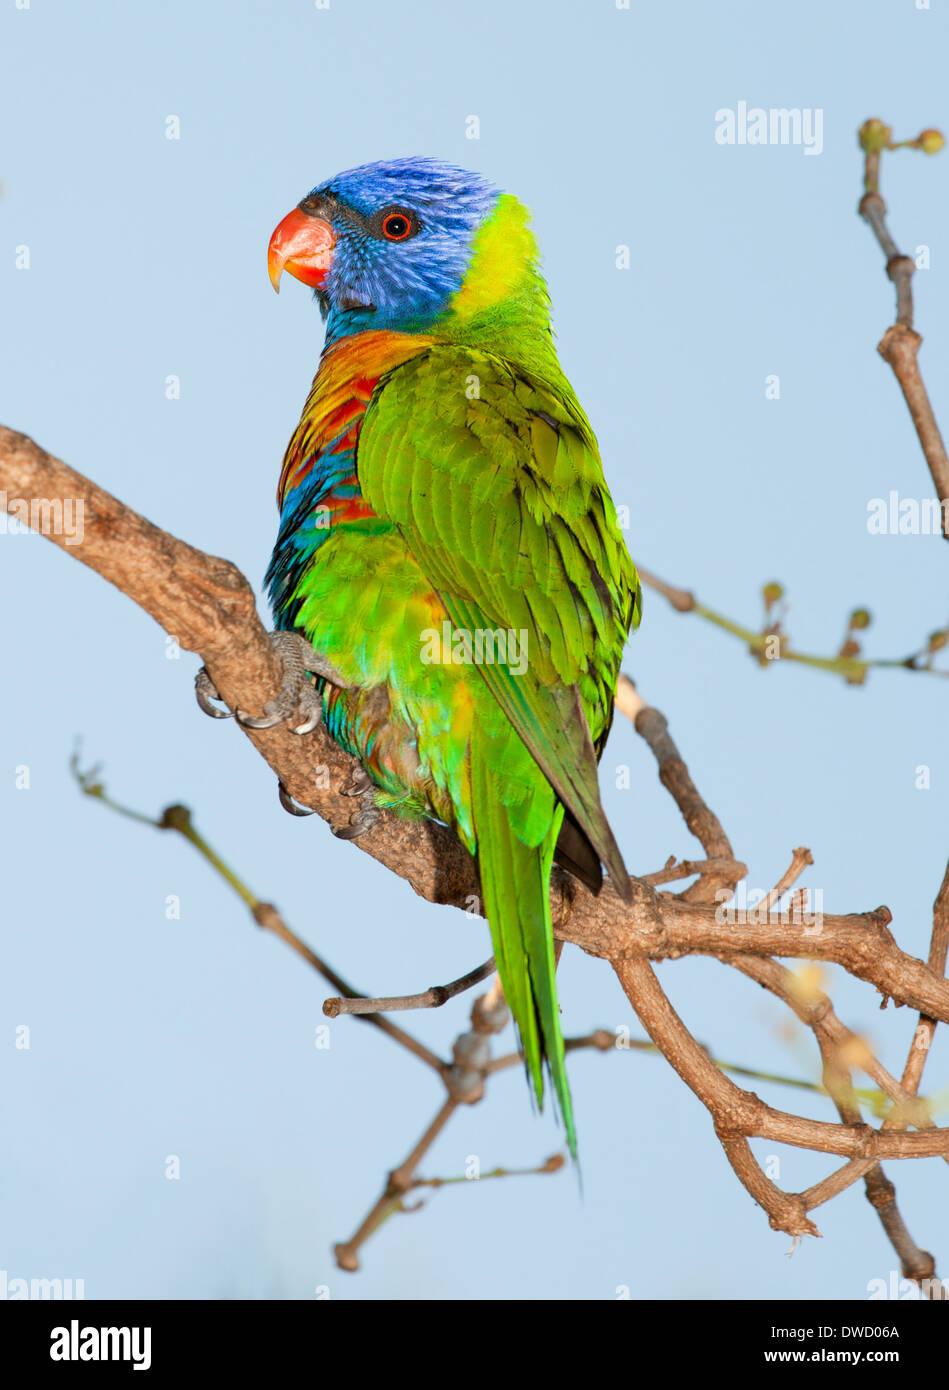 common native parrot the lorikeet, often kept as pets, noisy and cheeky Stock Photo